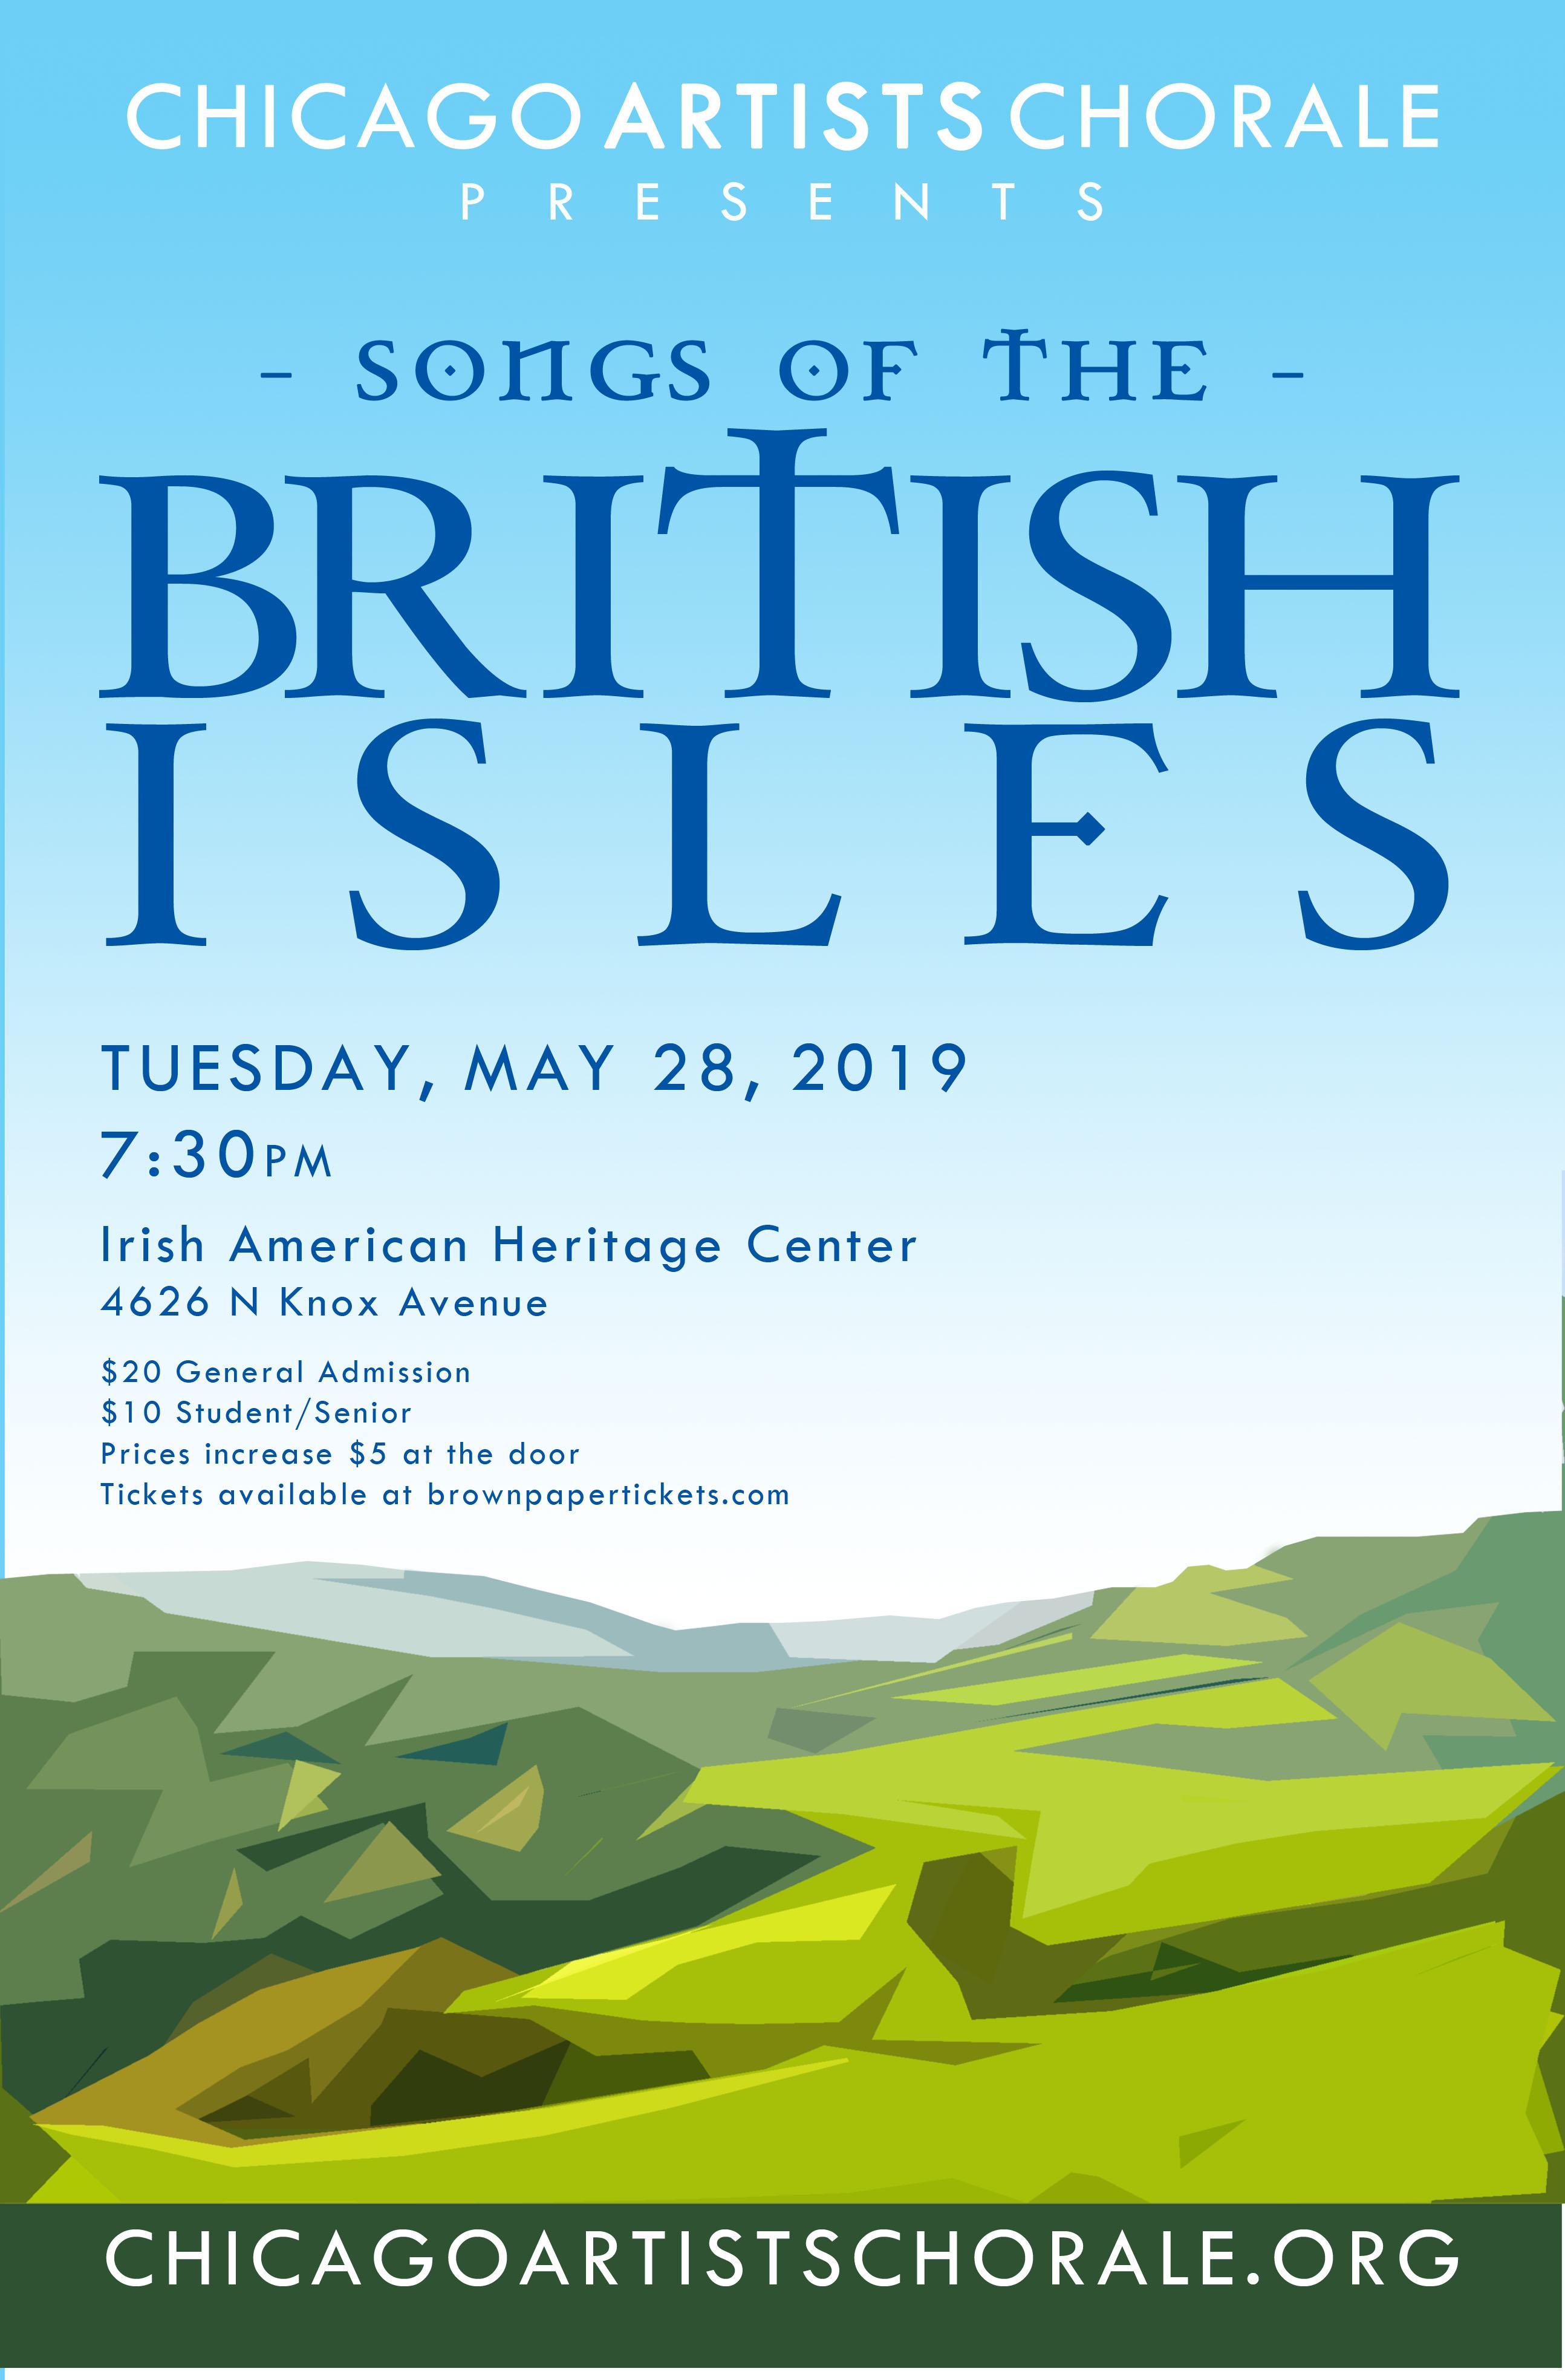 Concert poster - featuring artwork of nondescript green lands under a blue sky.